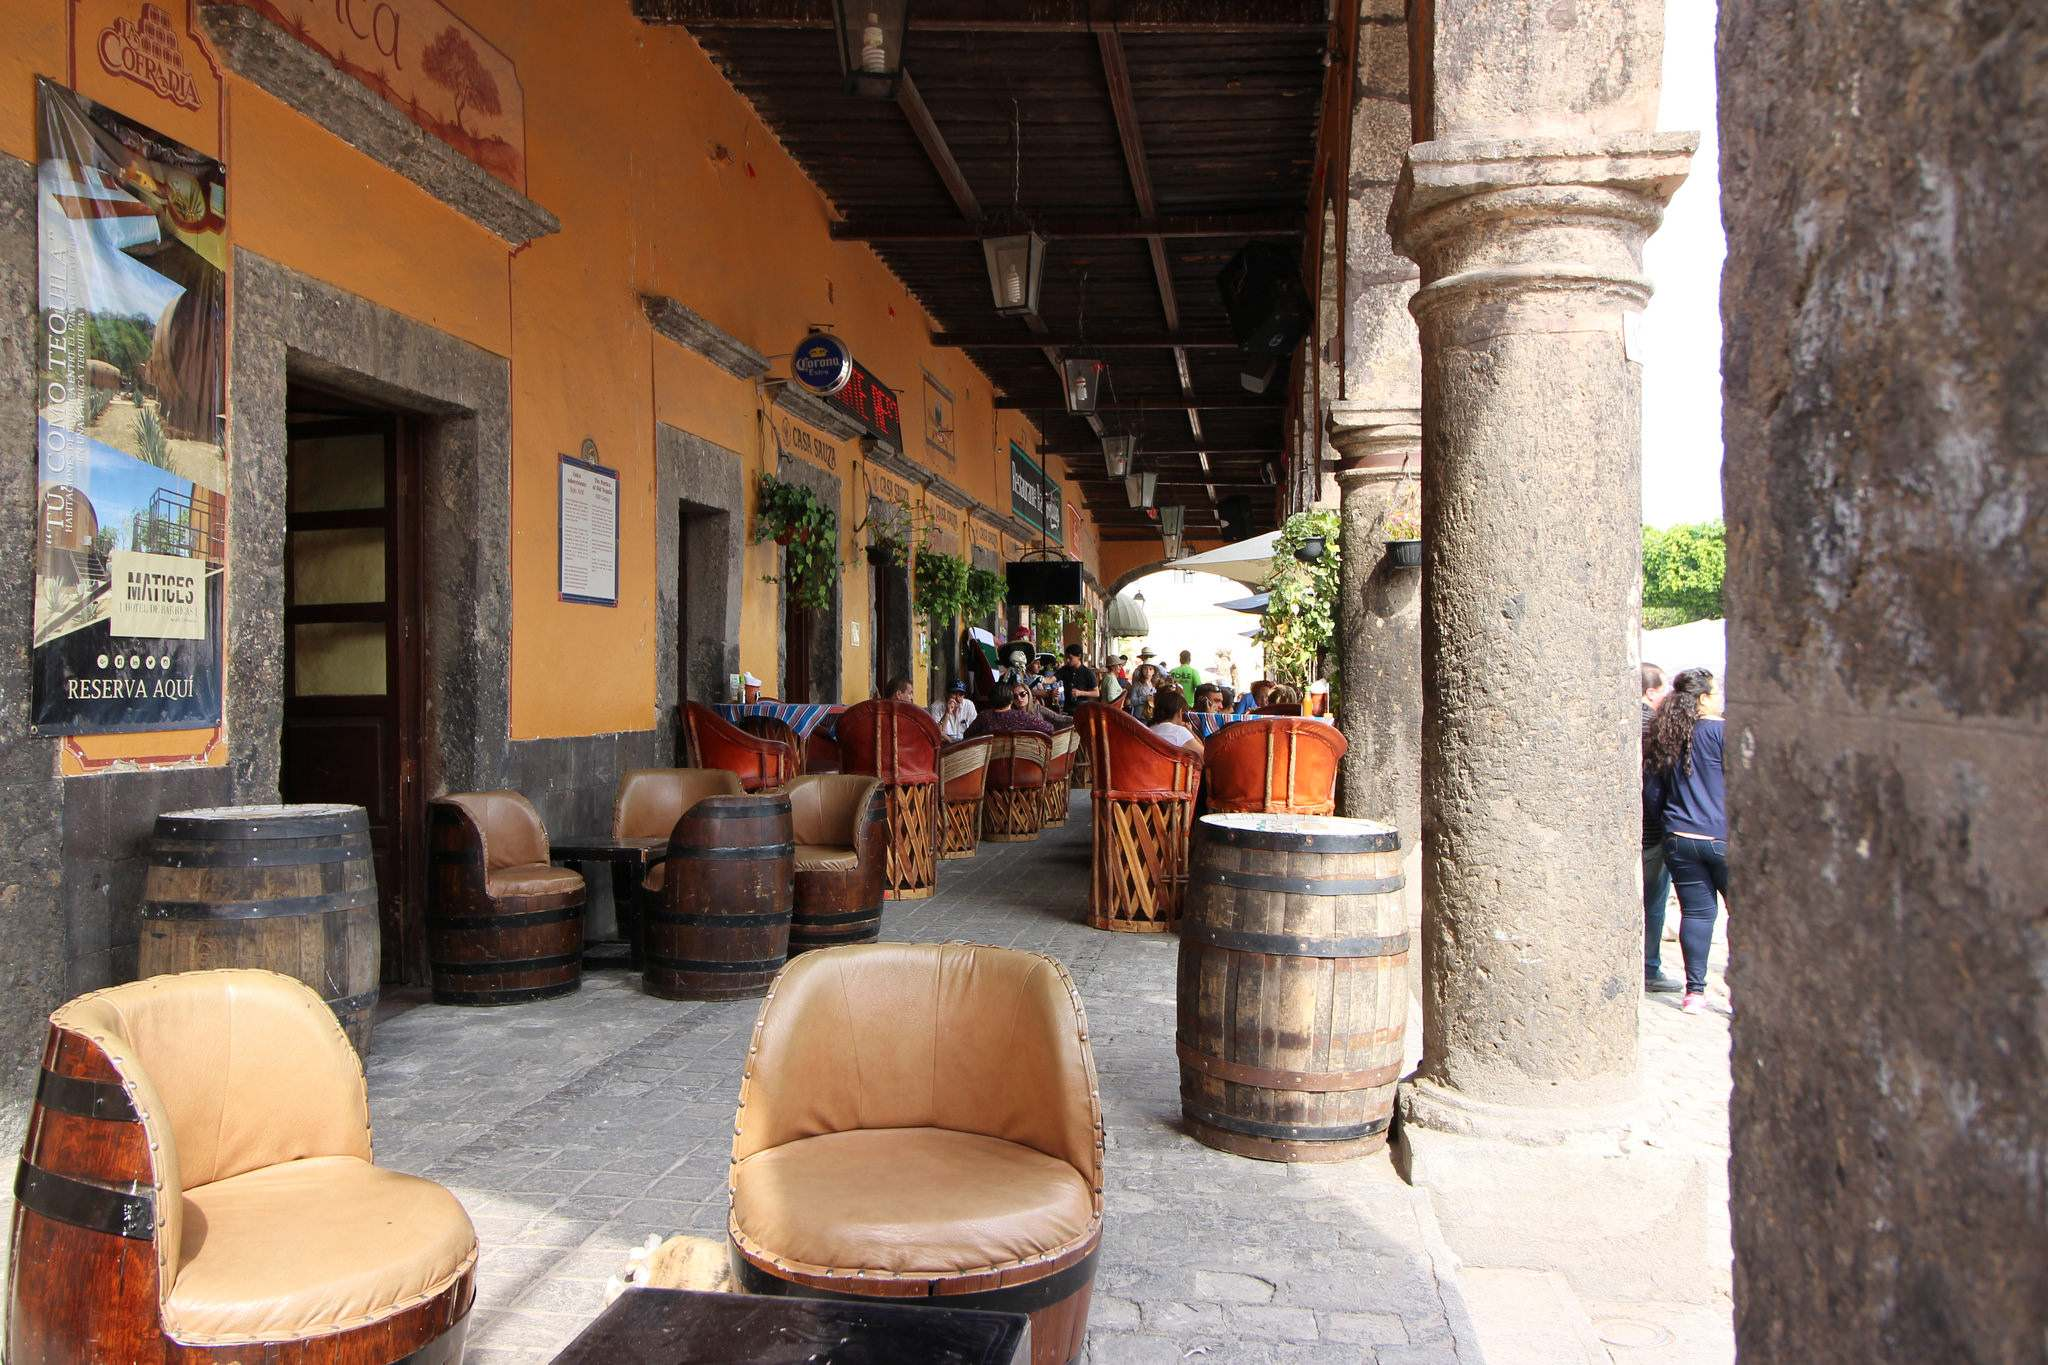 tequila orendain11 Tequila Orendain Tour   Mexicos Best Tequila